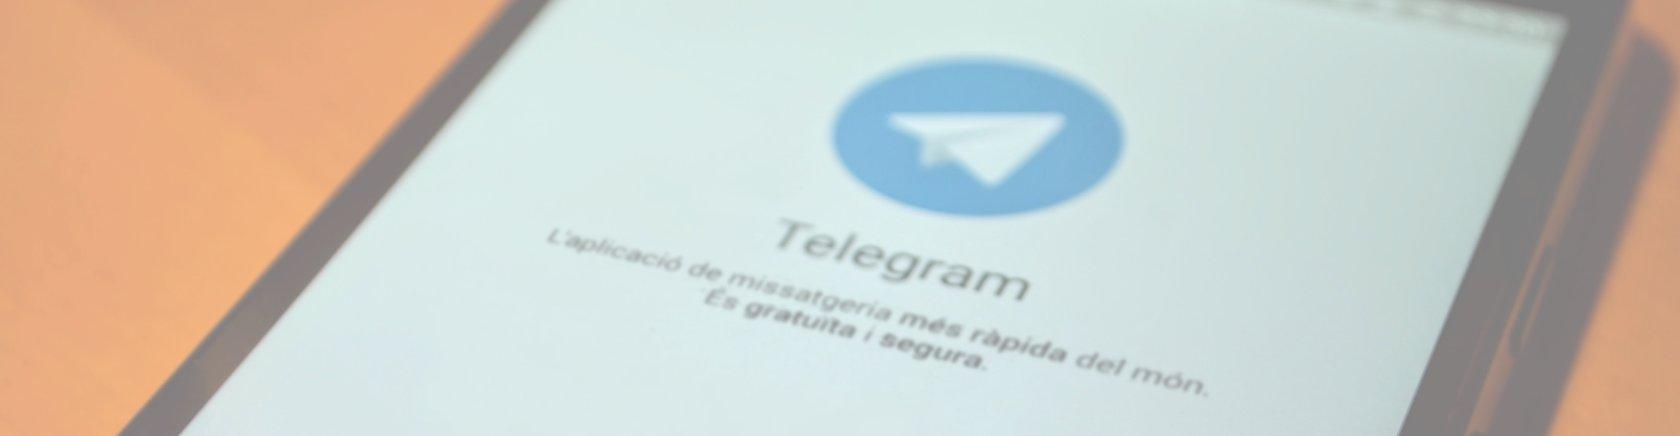 Canal de Telegram per a col·laboradors